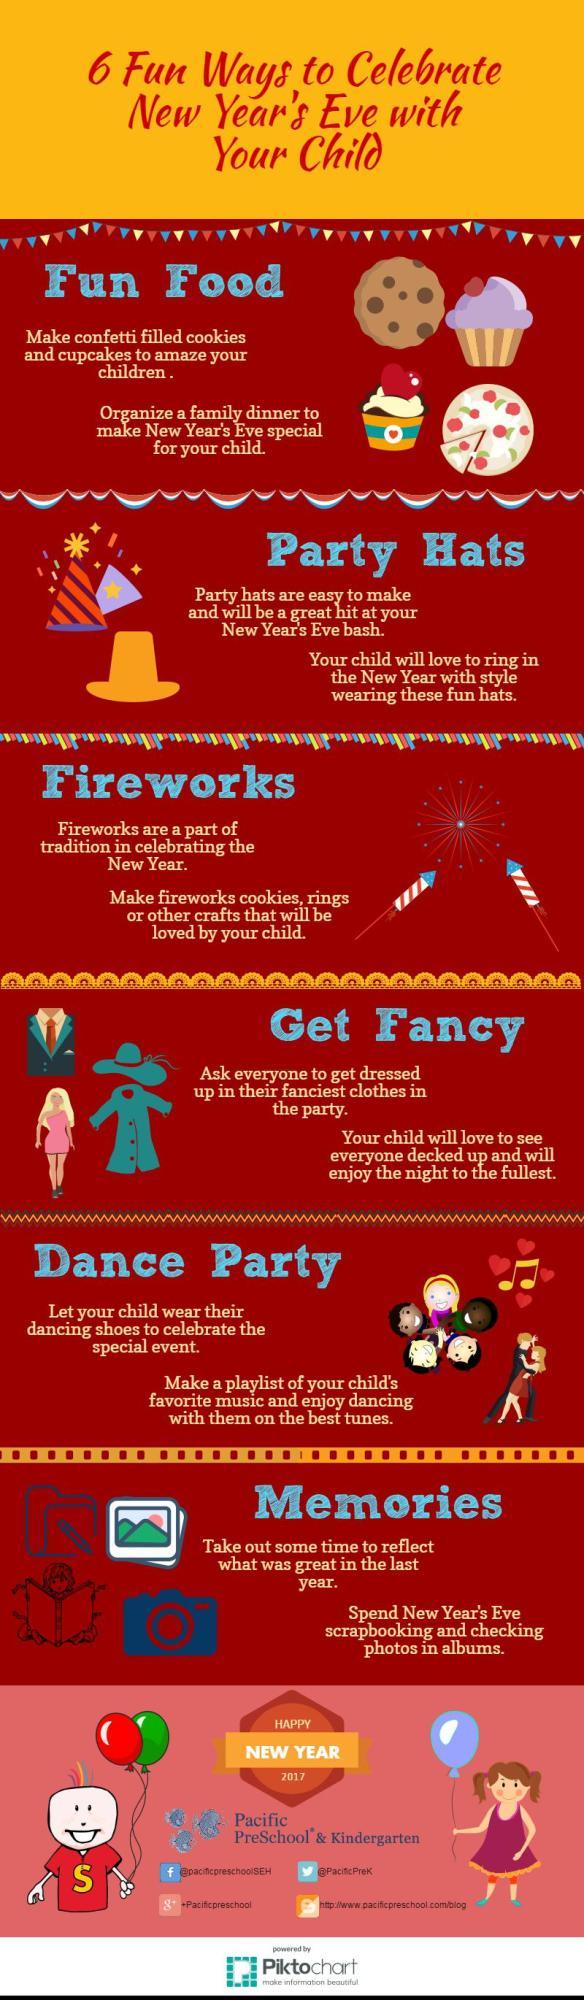 New Year Celebration infographic